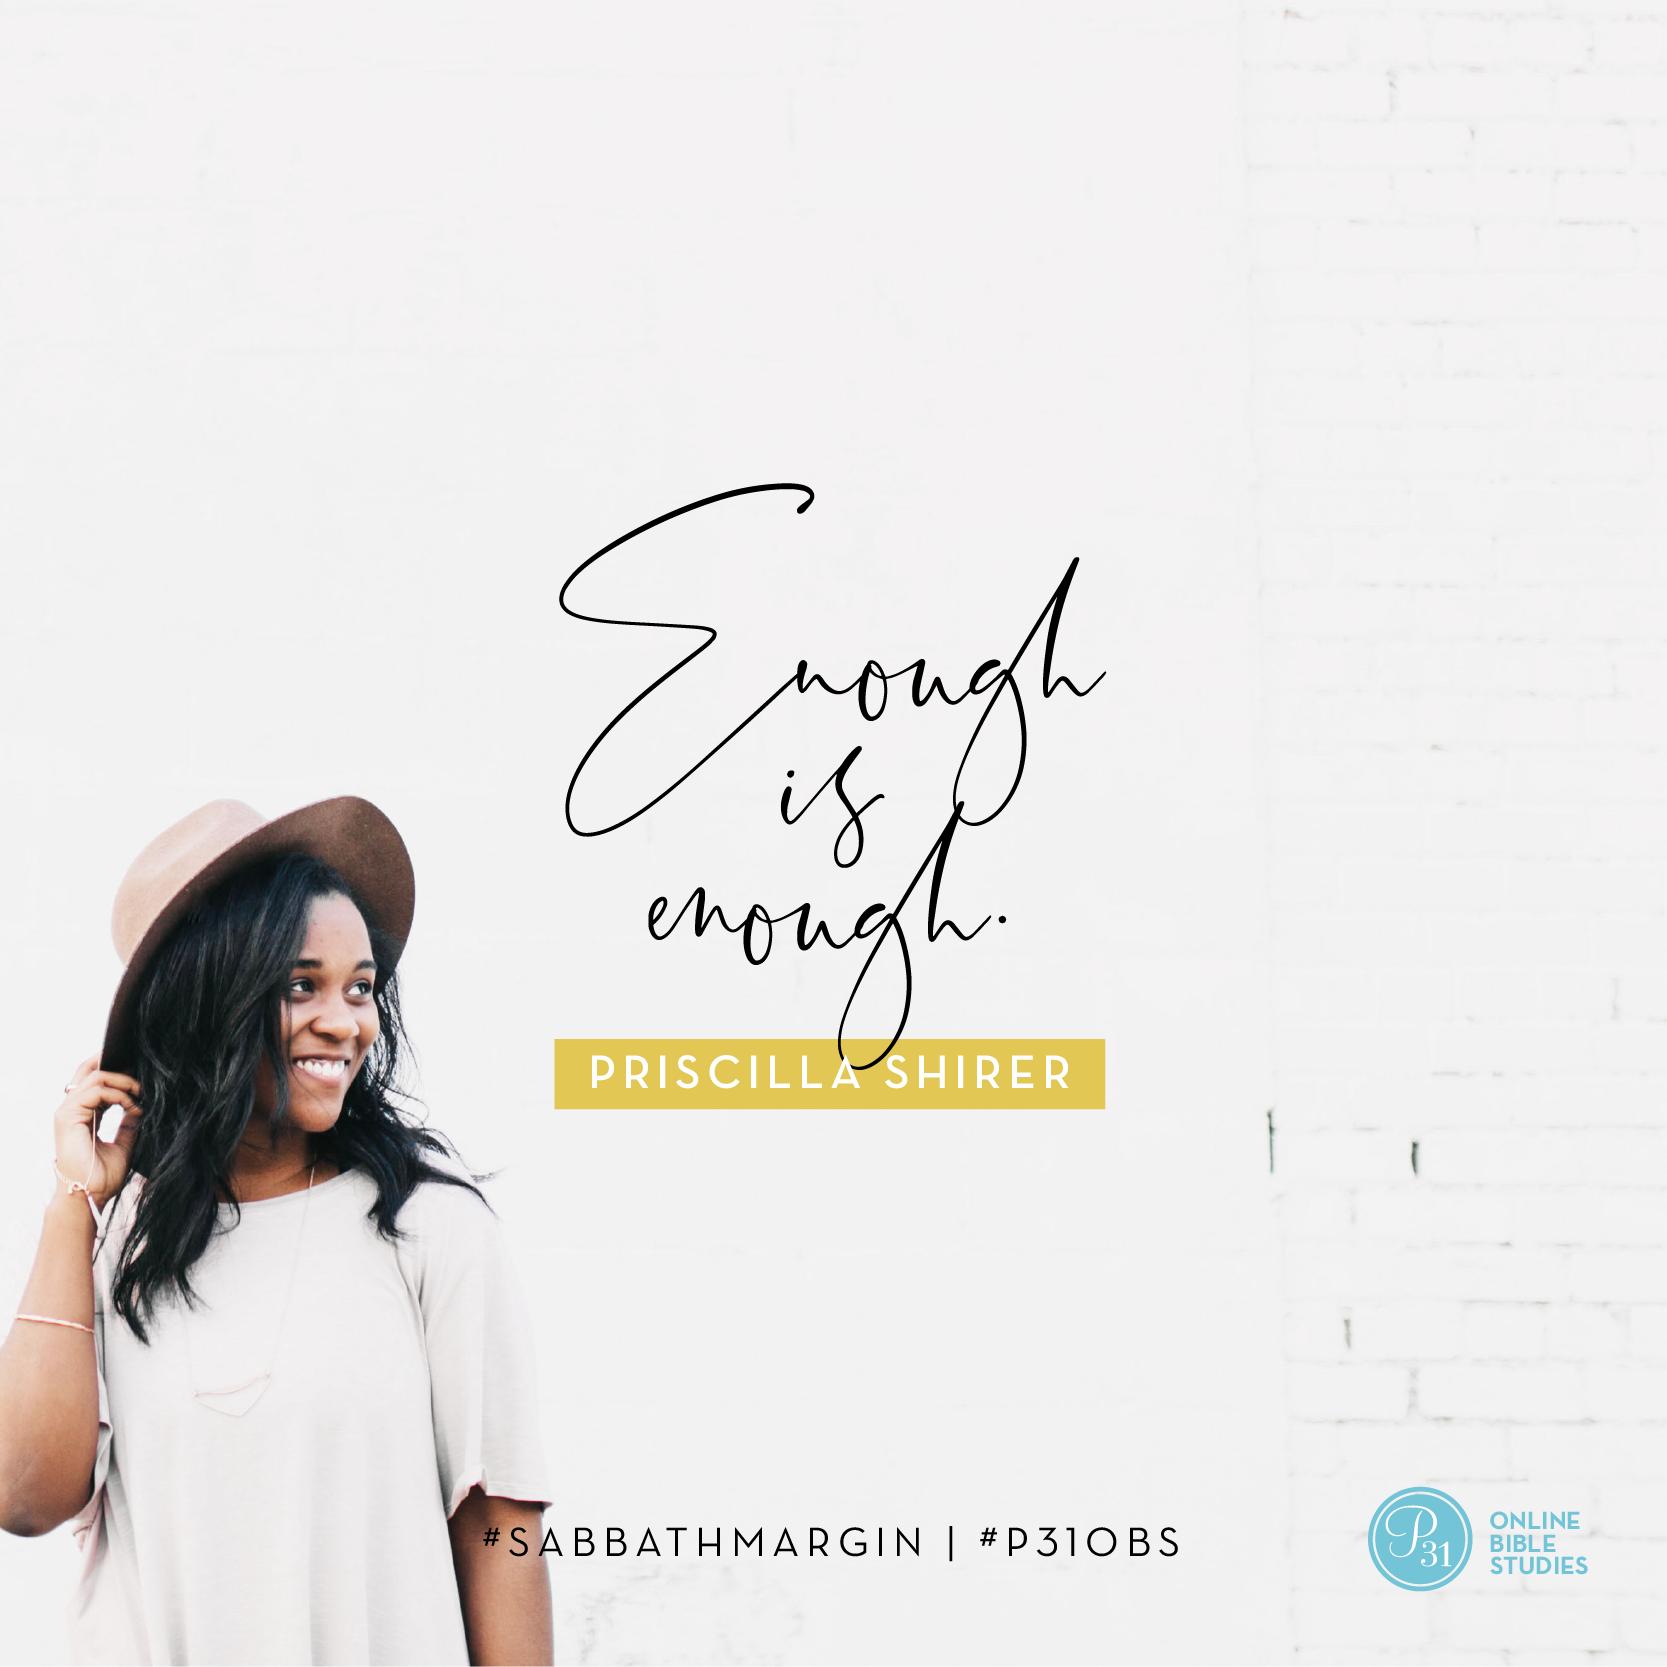 """Enough is enough."" - Priscilla Shirer #SabbathMargin | Proverbs 31 Online Bible Studies Week 2 #P31OBS"